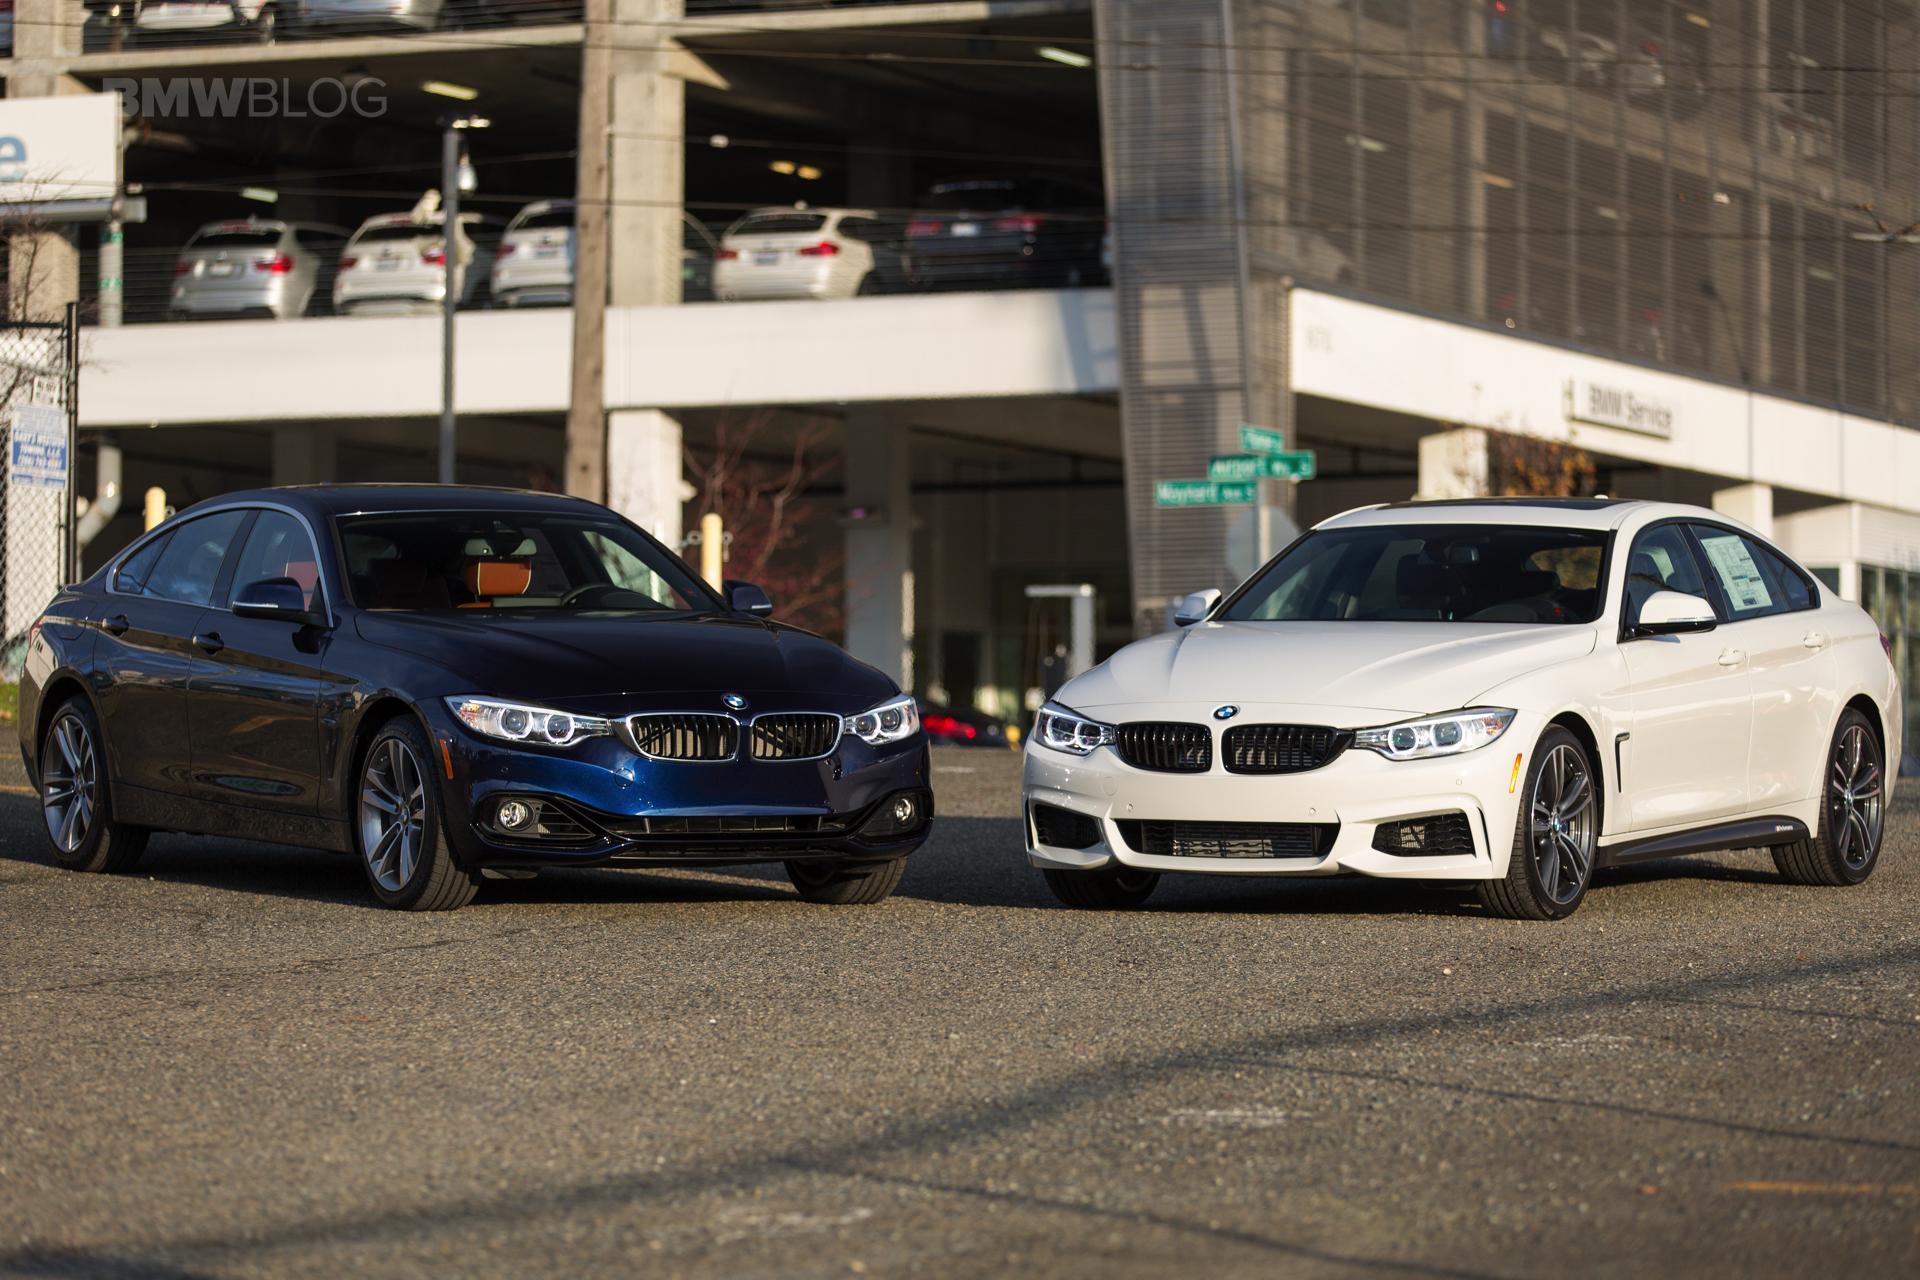 BMW 4 Series Gran Coupe Tanzanite Blue Alpine White 11